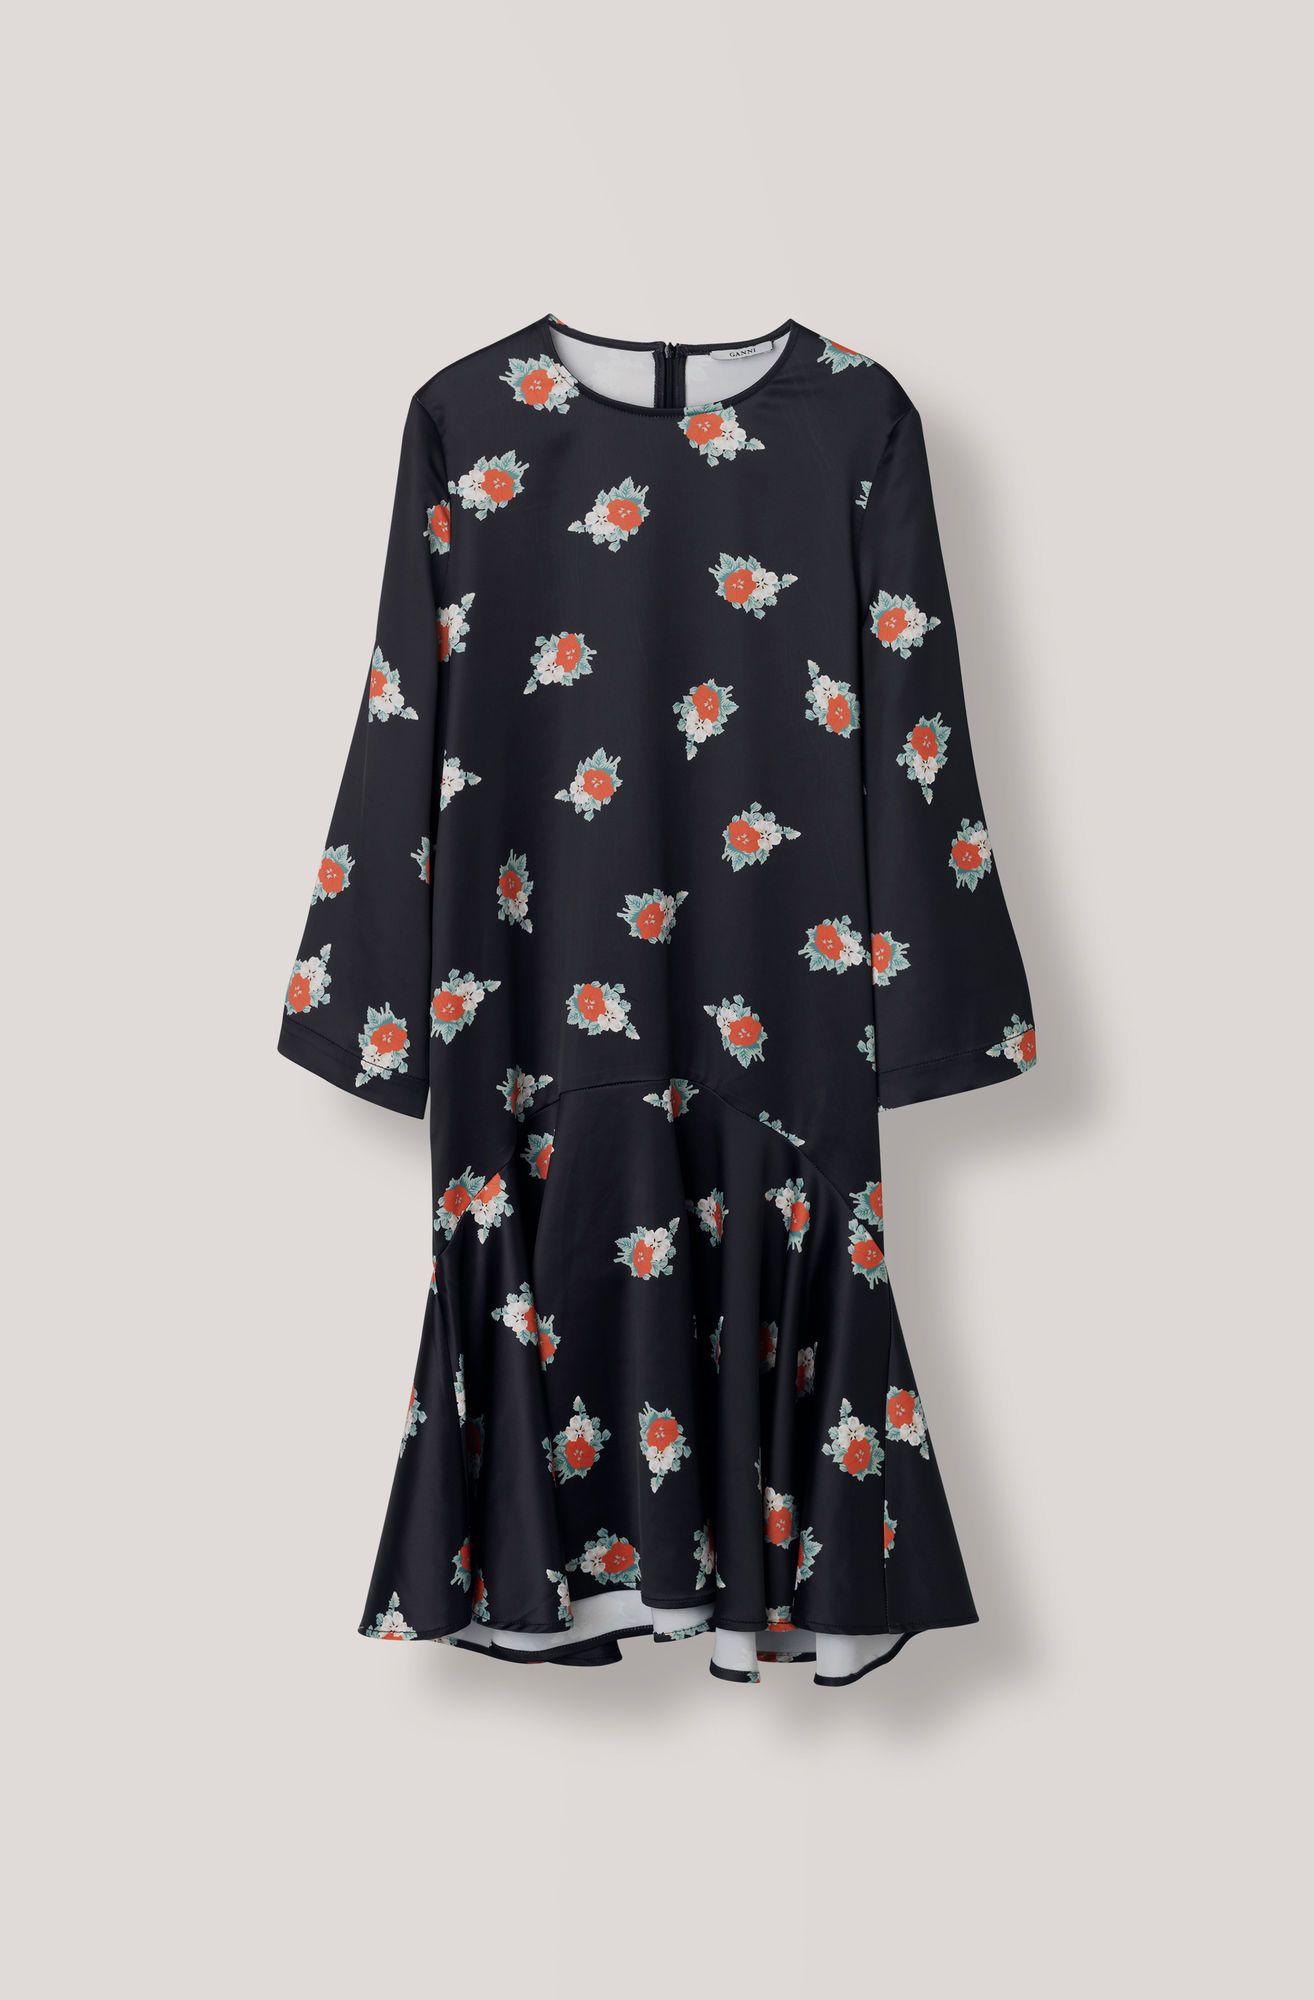 e508b3e3 Glenmore Dress, Black | Floral | Dresses, Sleeves, Casual dresses